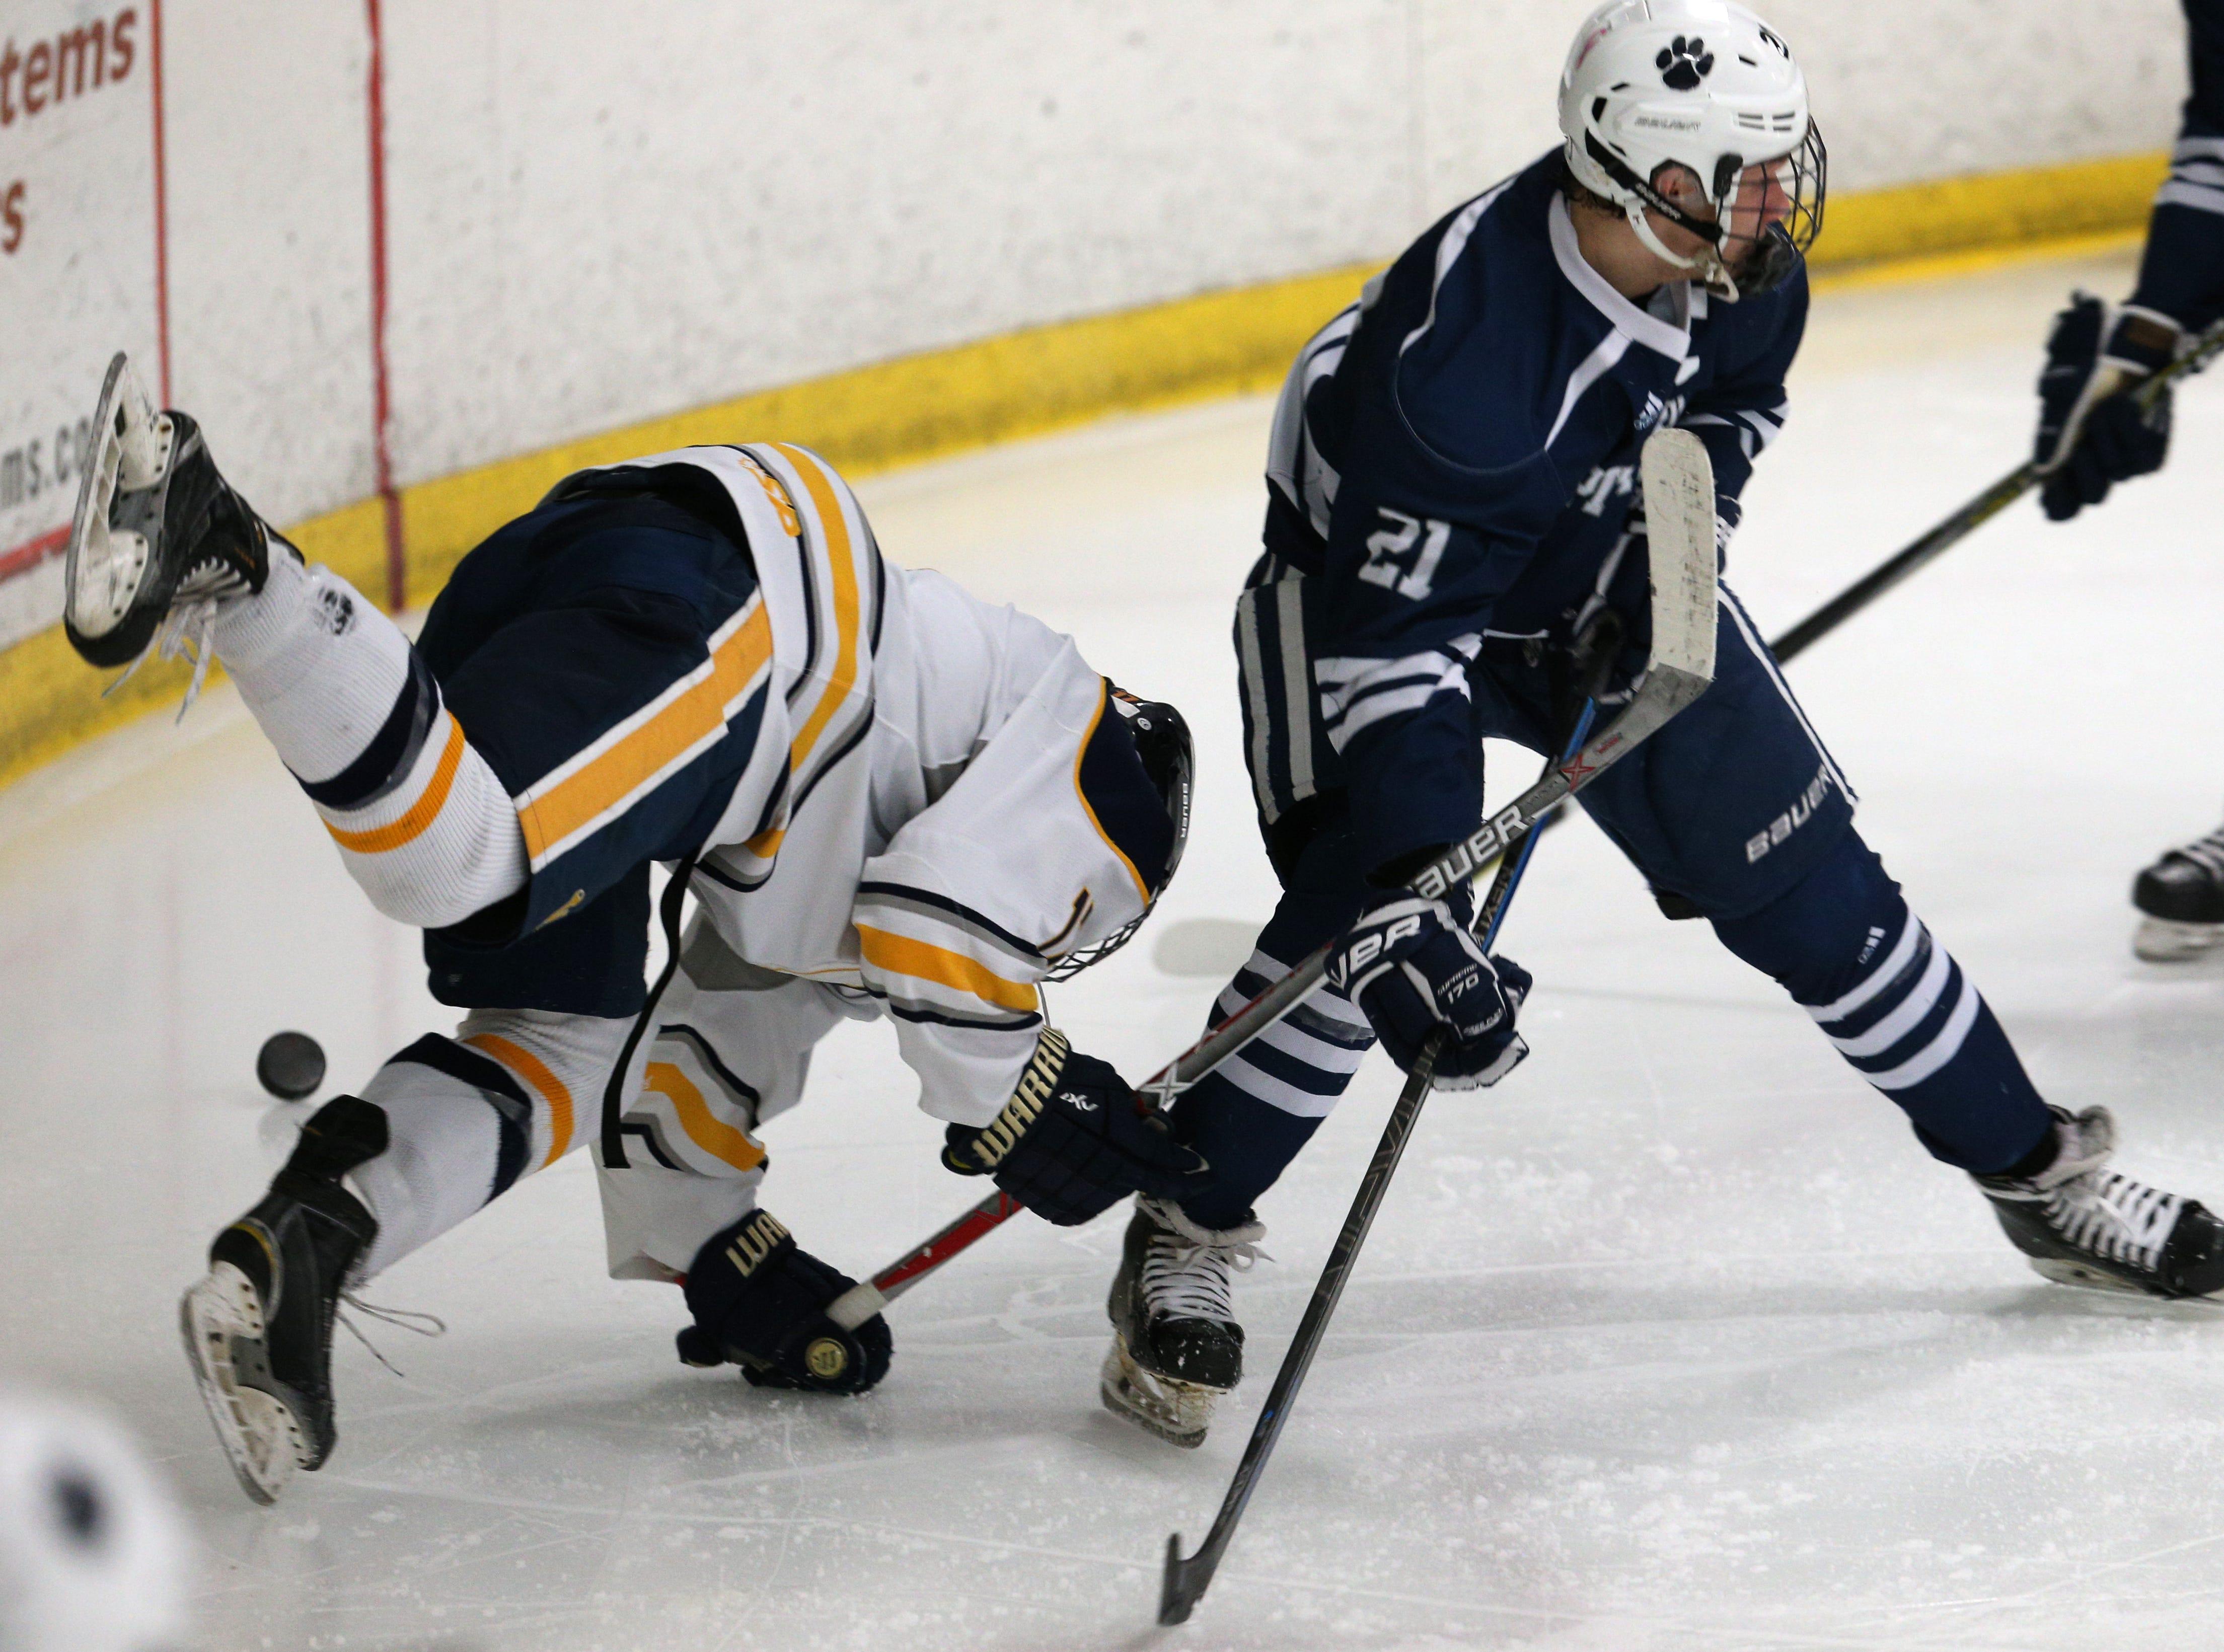 Victor  #17 Roman Czornobil hit the ice against Pittsford.